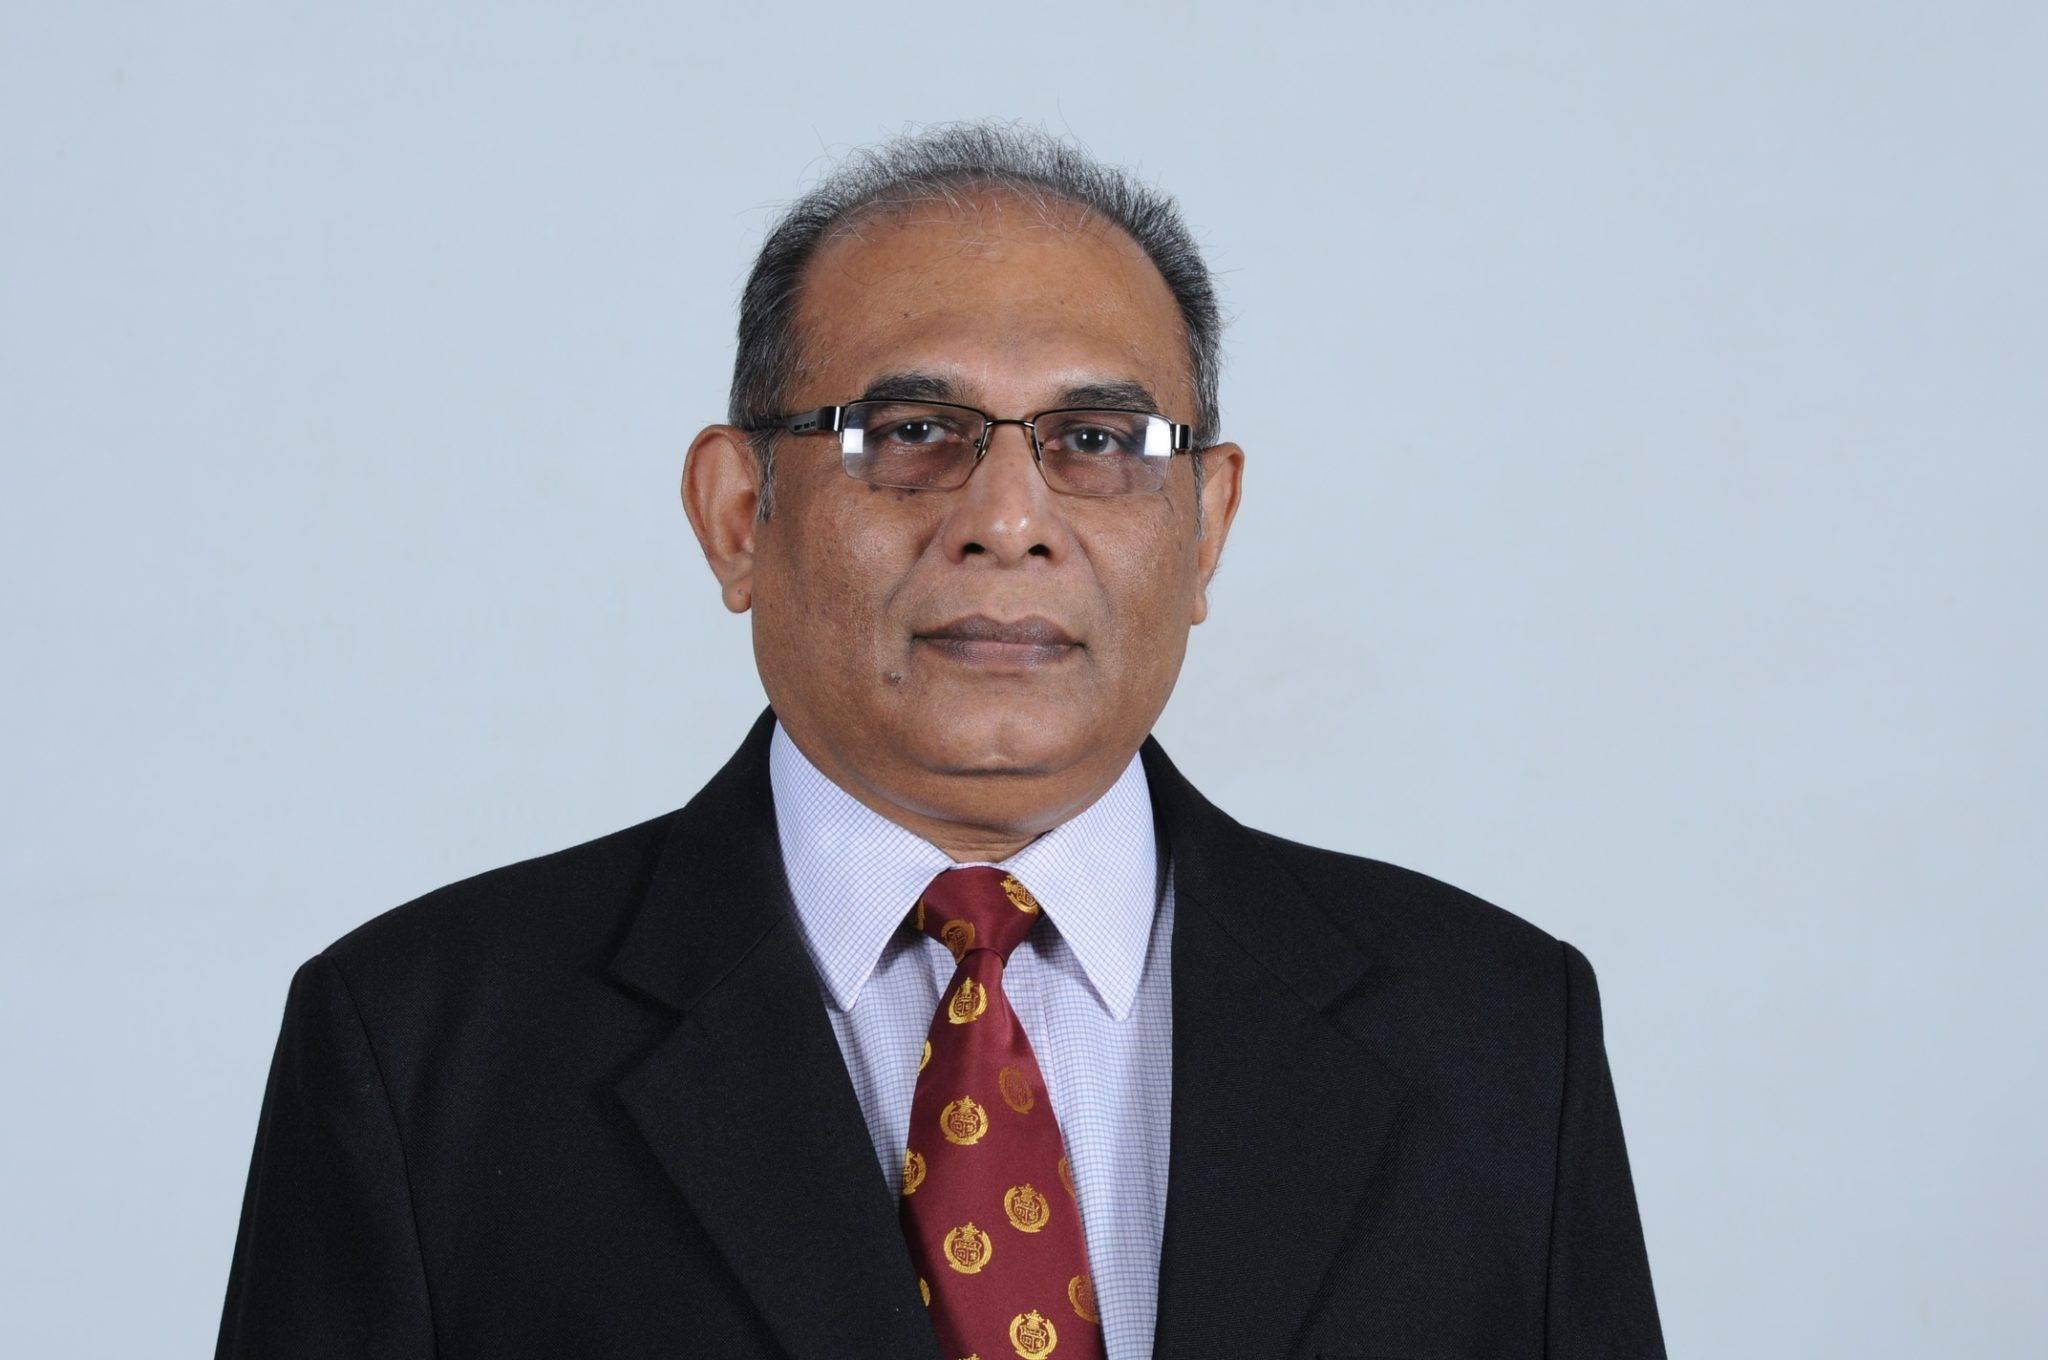 Professor K. Tharu Benny